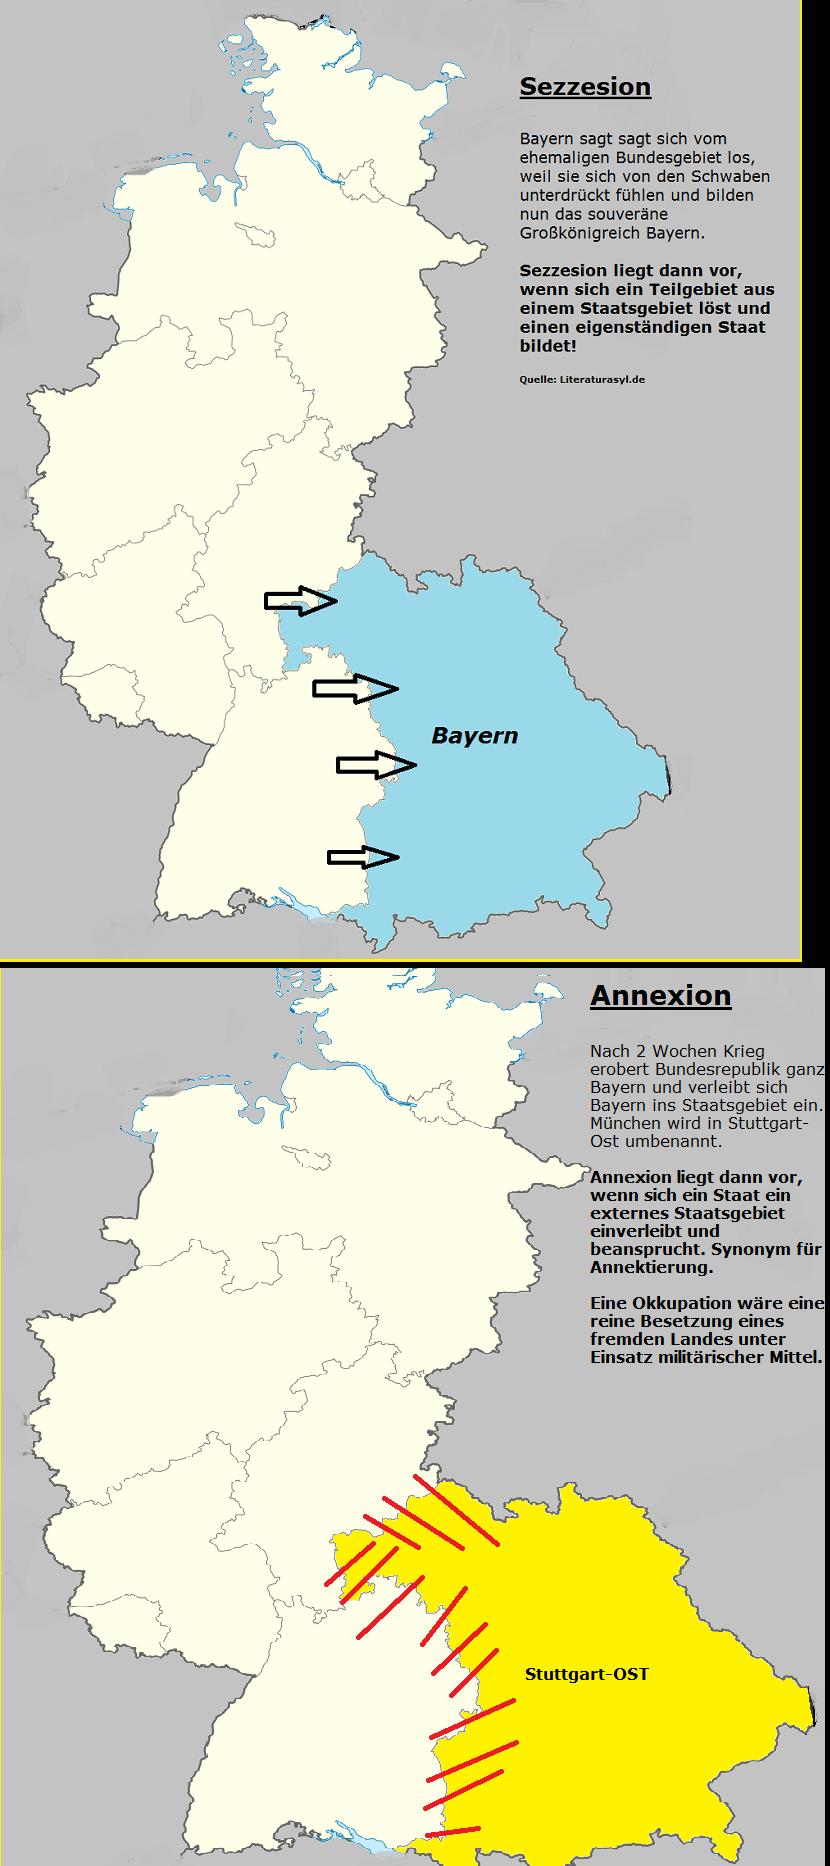 Sezession, Annexion, Okkupation - Politikbegriffe